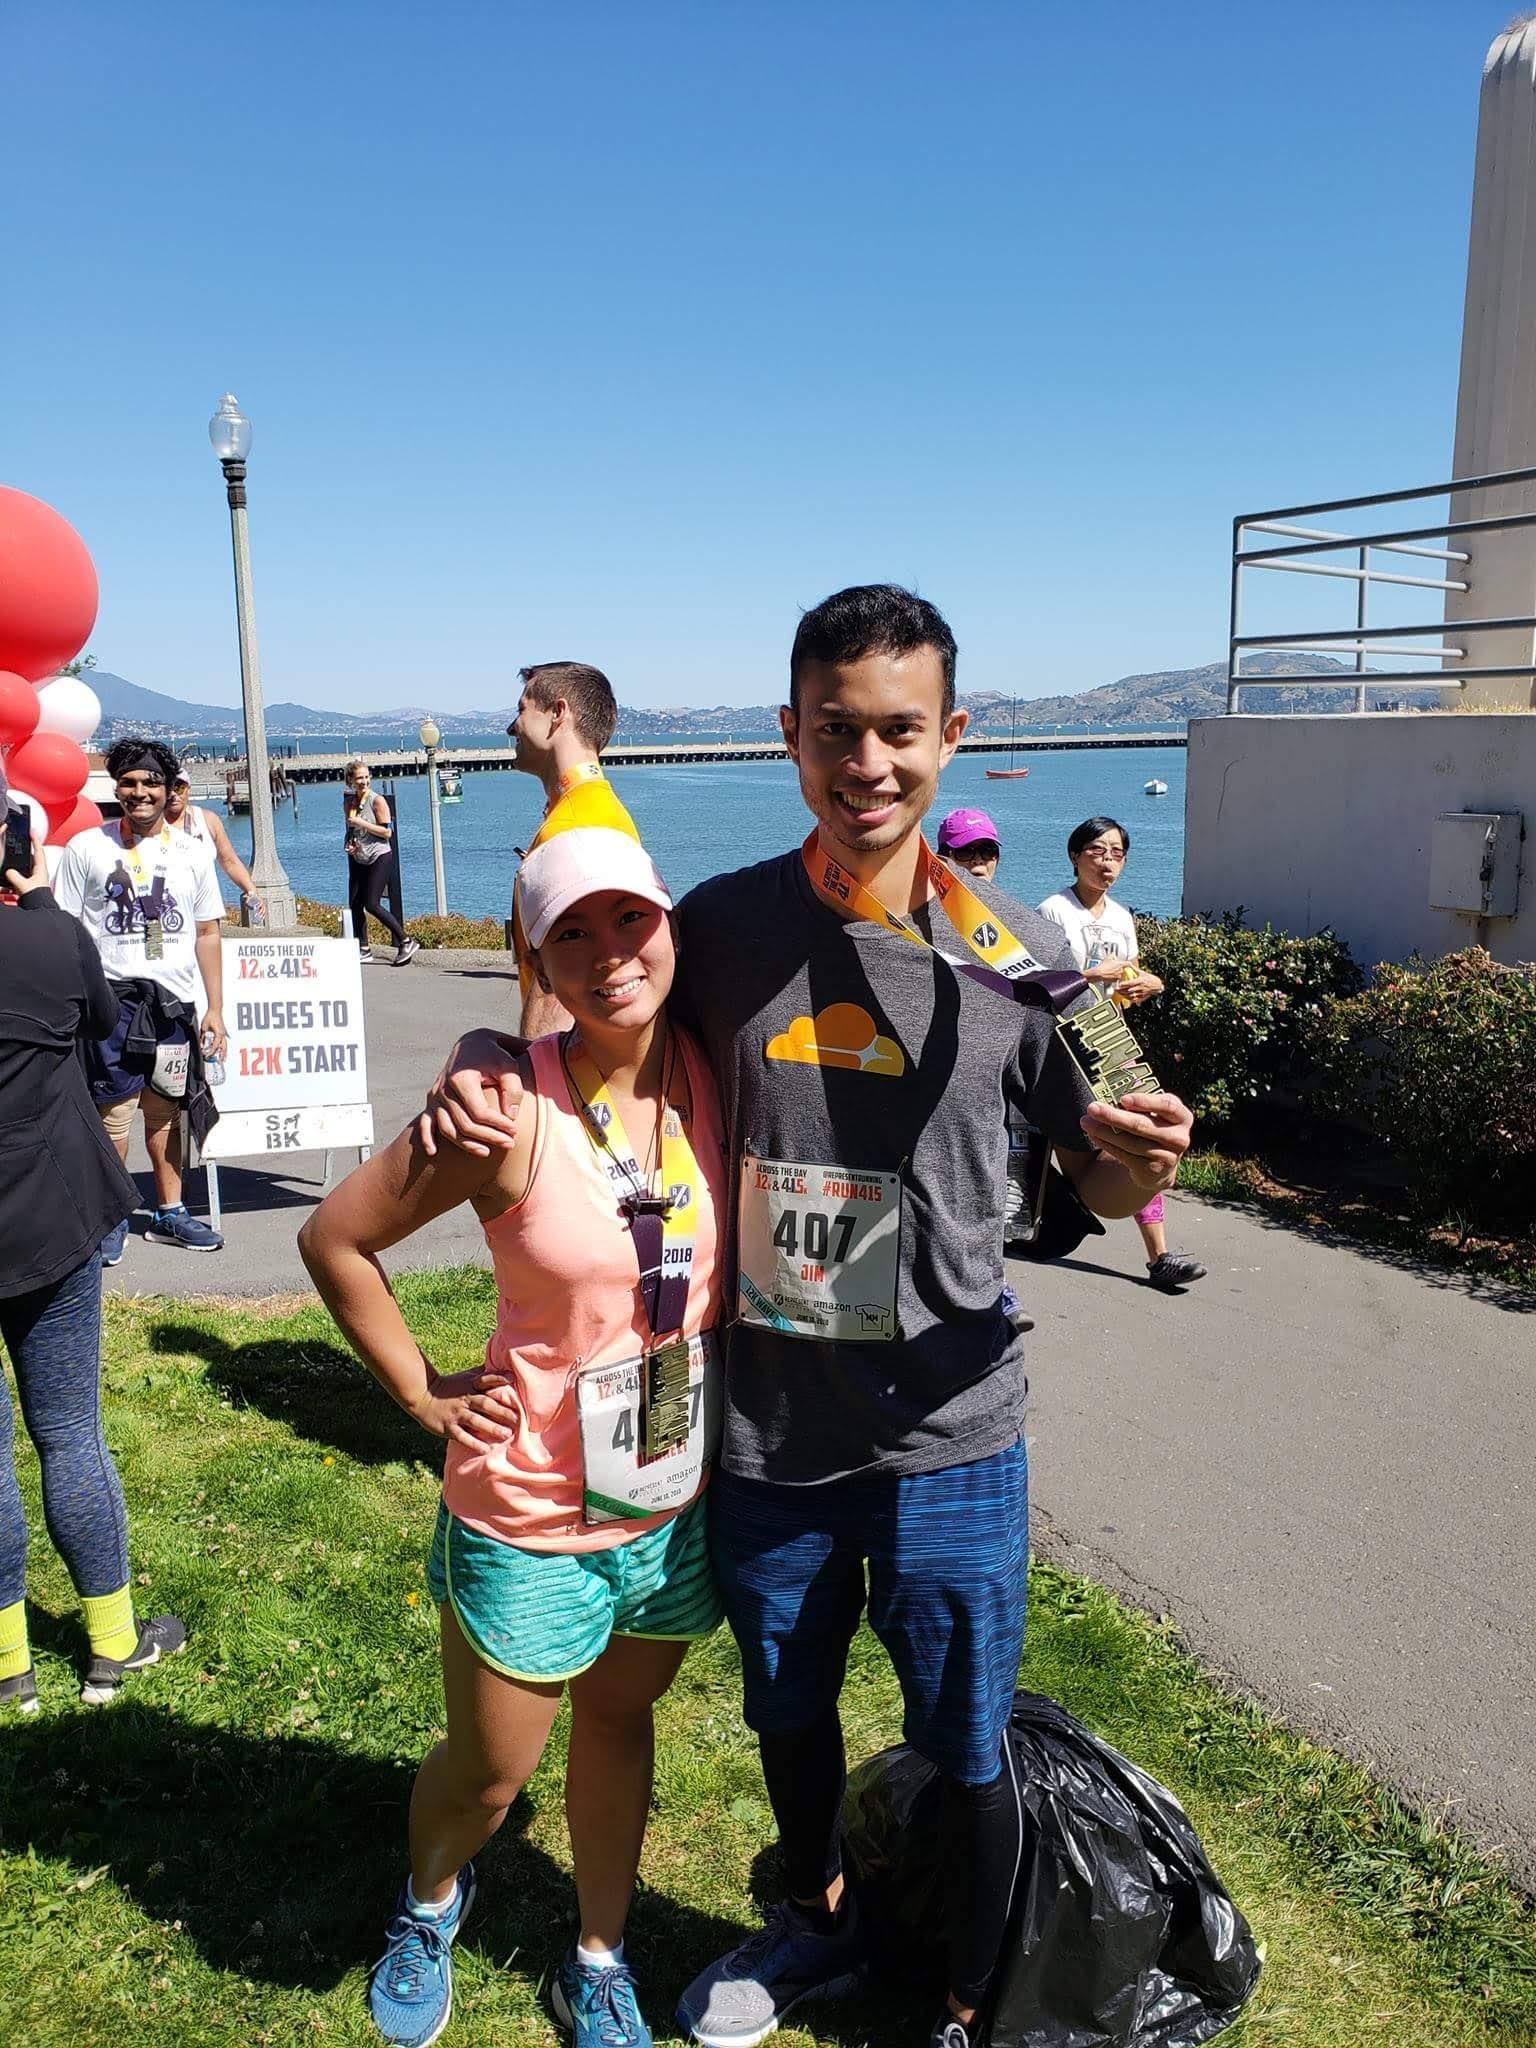 A 12k run together, June 2018